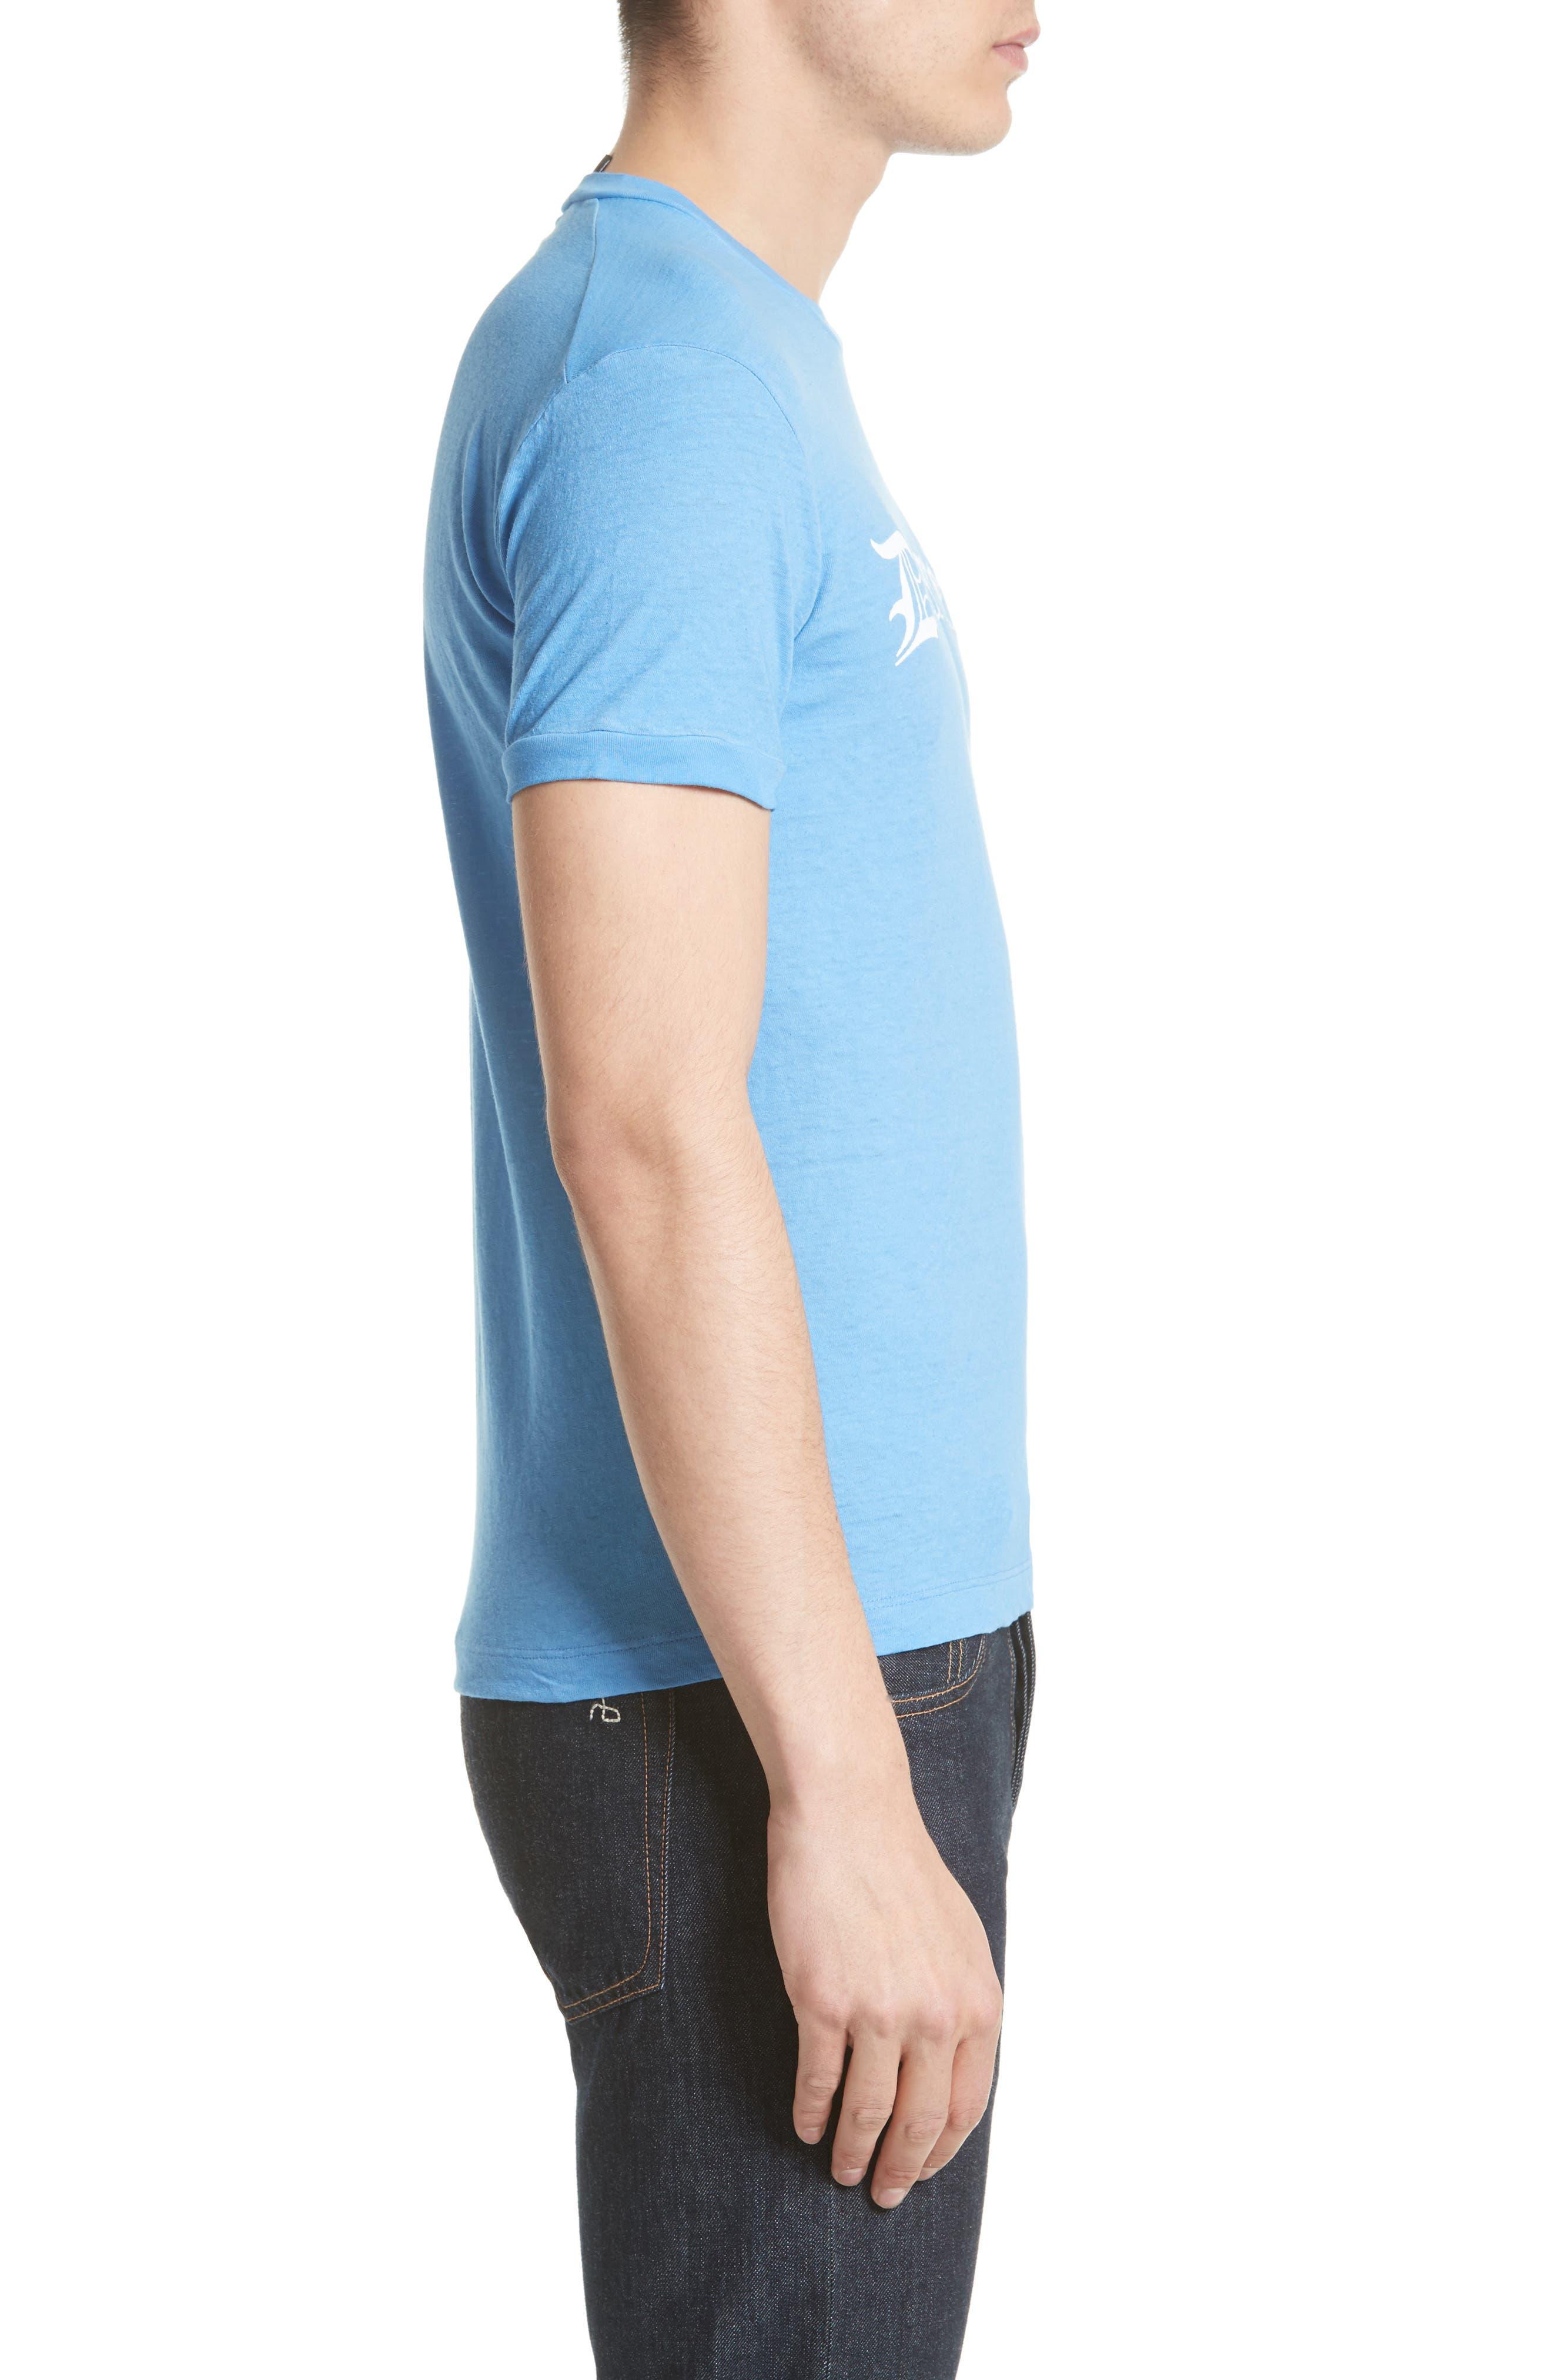 Dquared2 Cotton T-Shirt,                             Alternate thumbnail 3, color,                             449